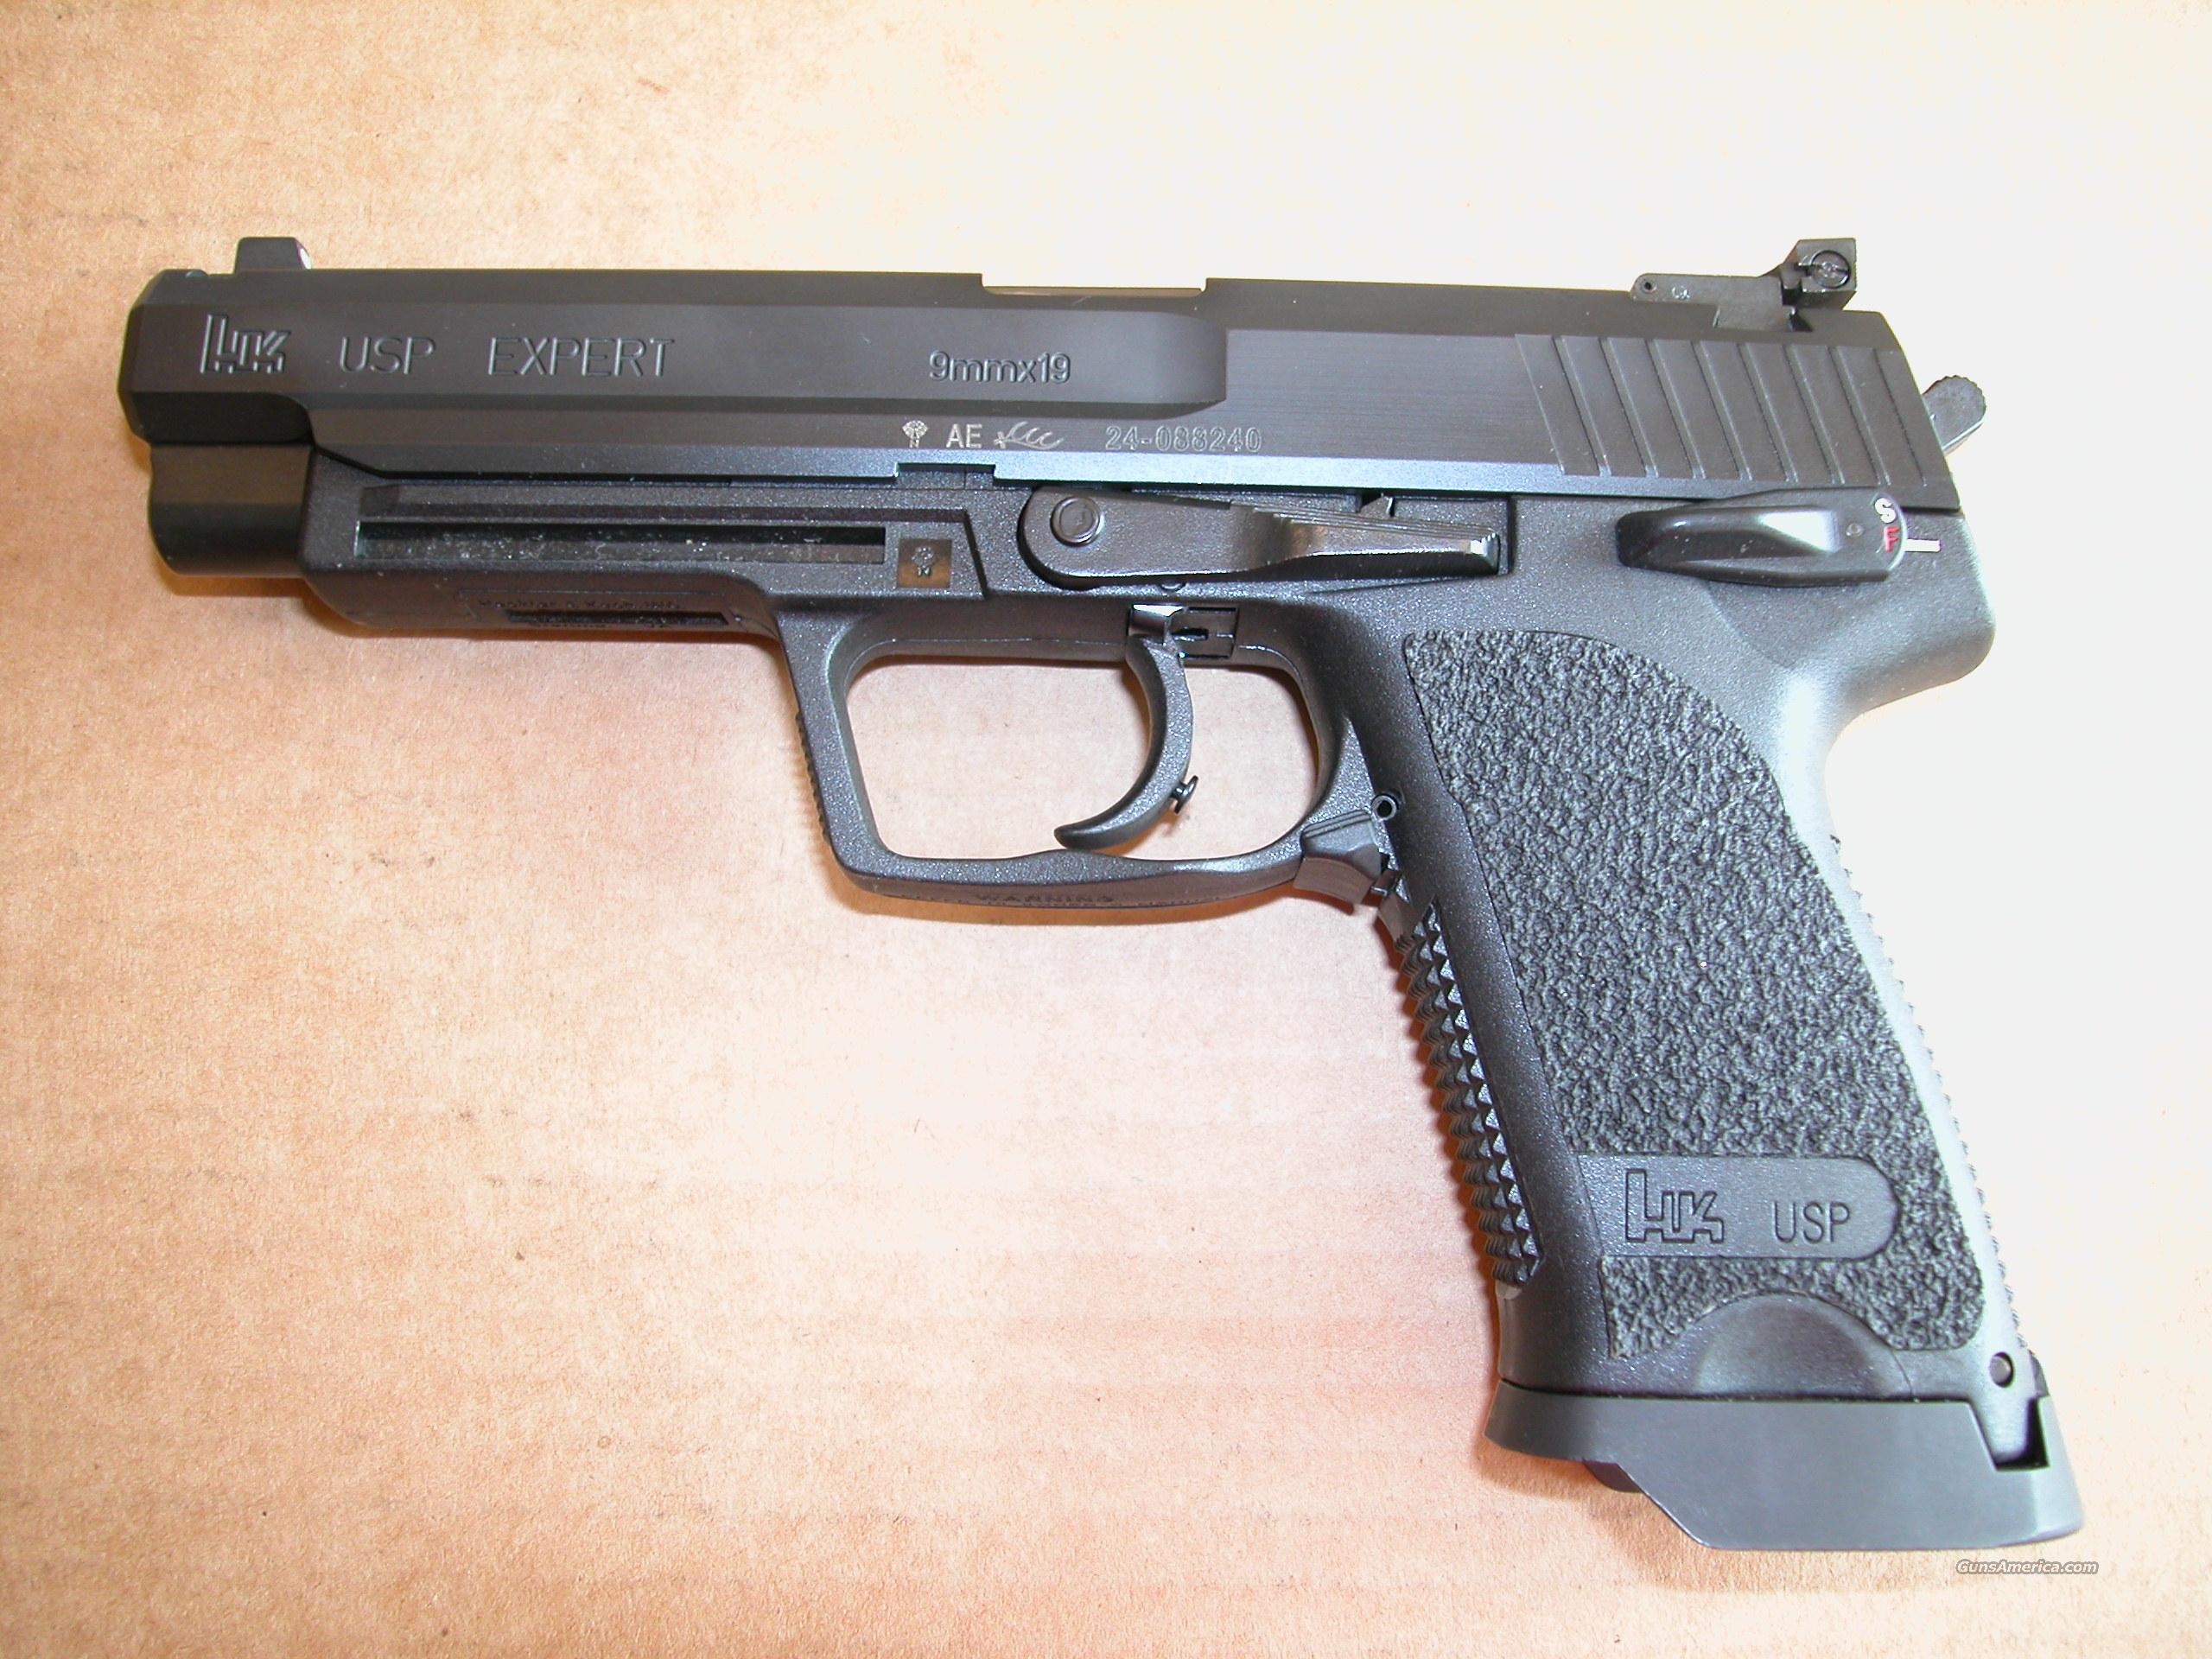 Heckler & Koch, H&K, HK USP Expert 9mm Pistol for sale